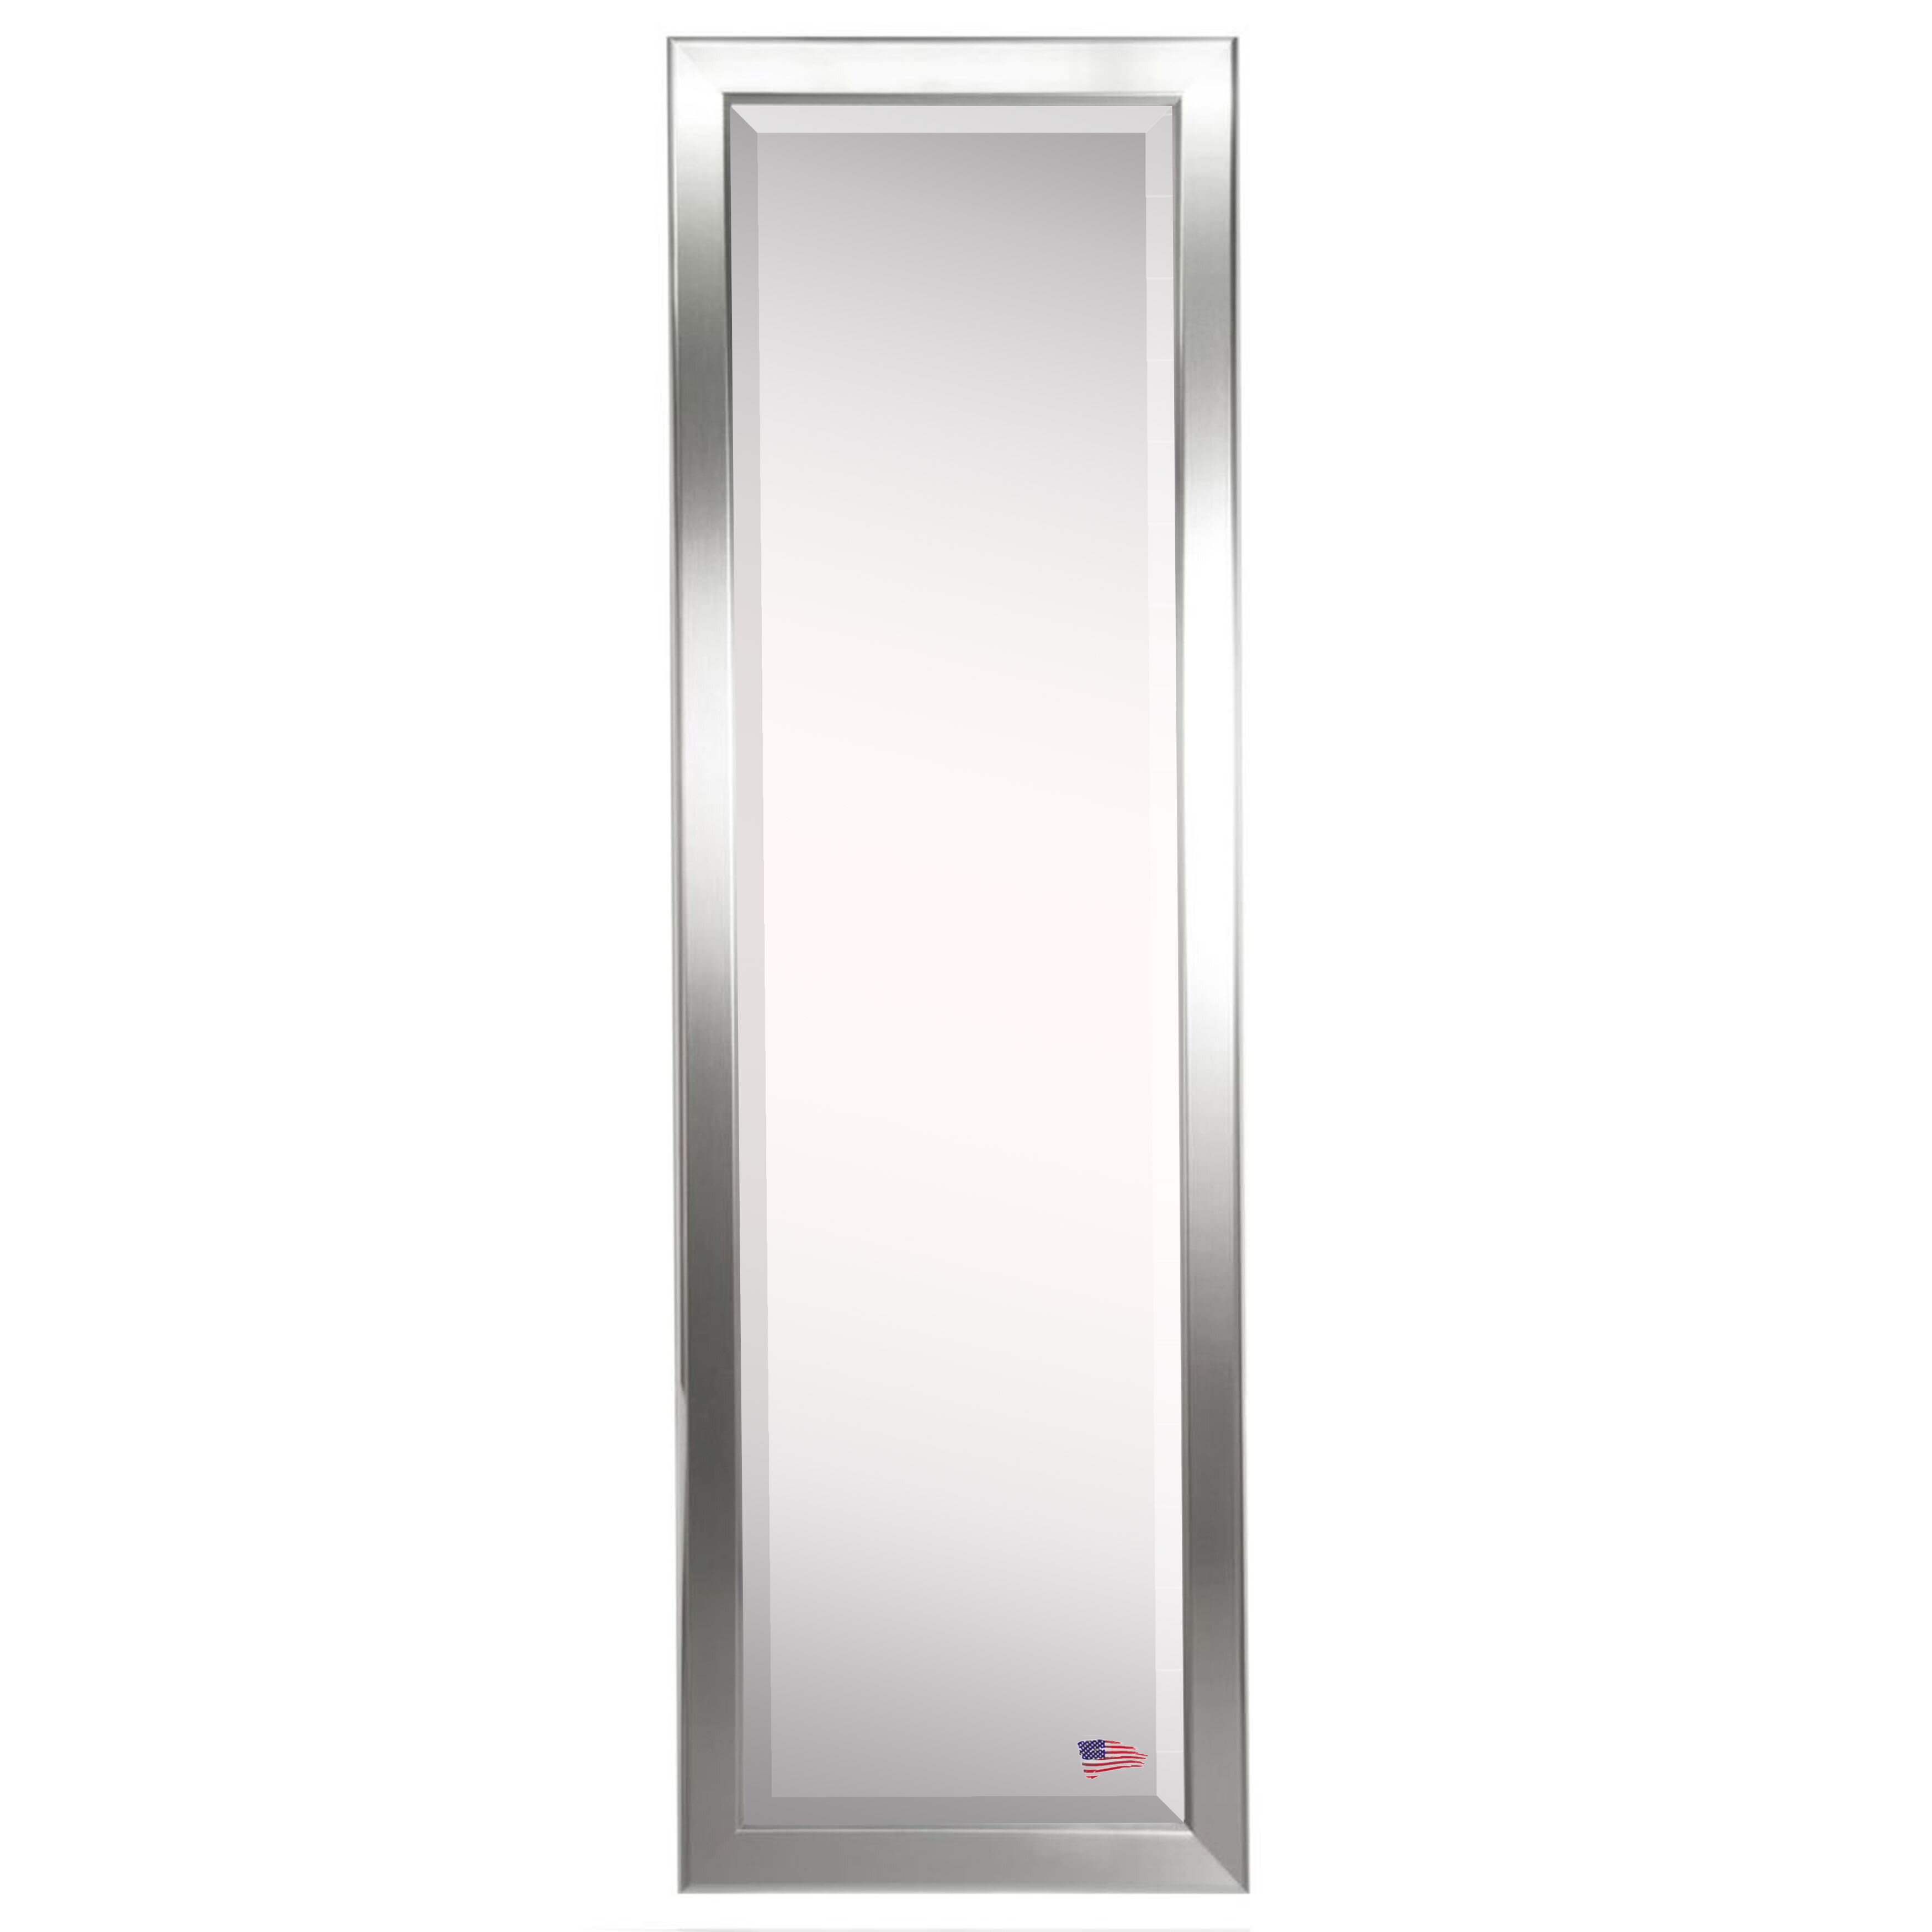 Rayne mirrors jovie jane round edge minimal silver full for Silver full length mirror